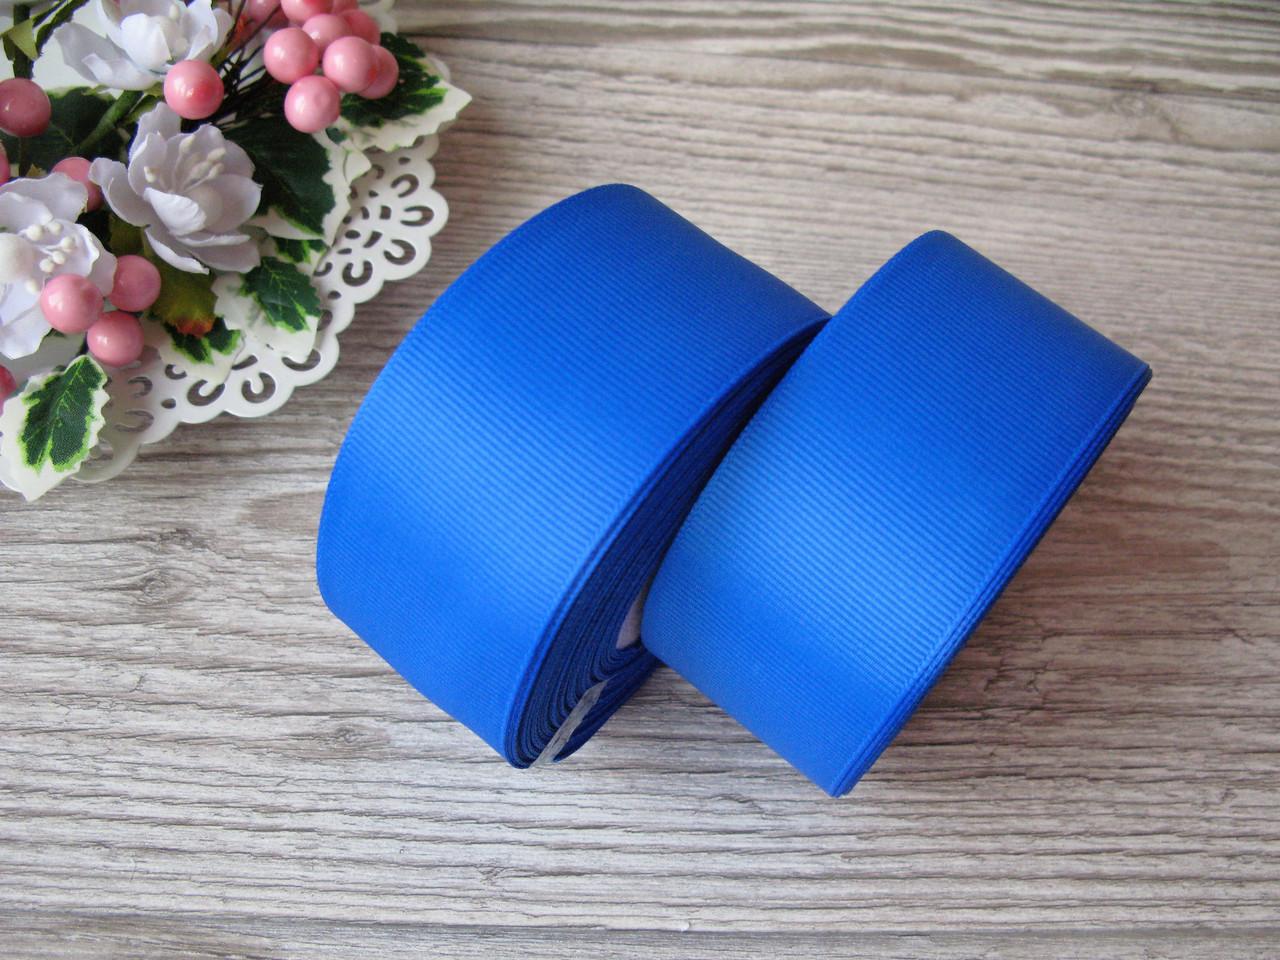 Лента репсовая, на метраж, ширина 4 см, цвет синий, 4 грн за метр.